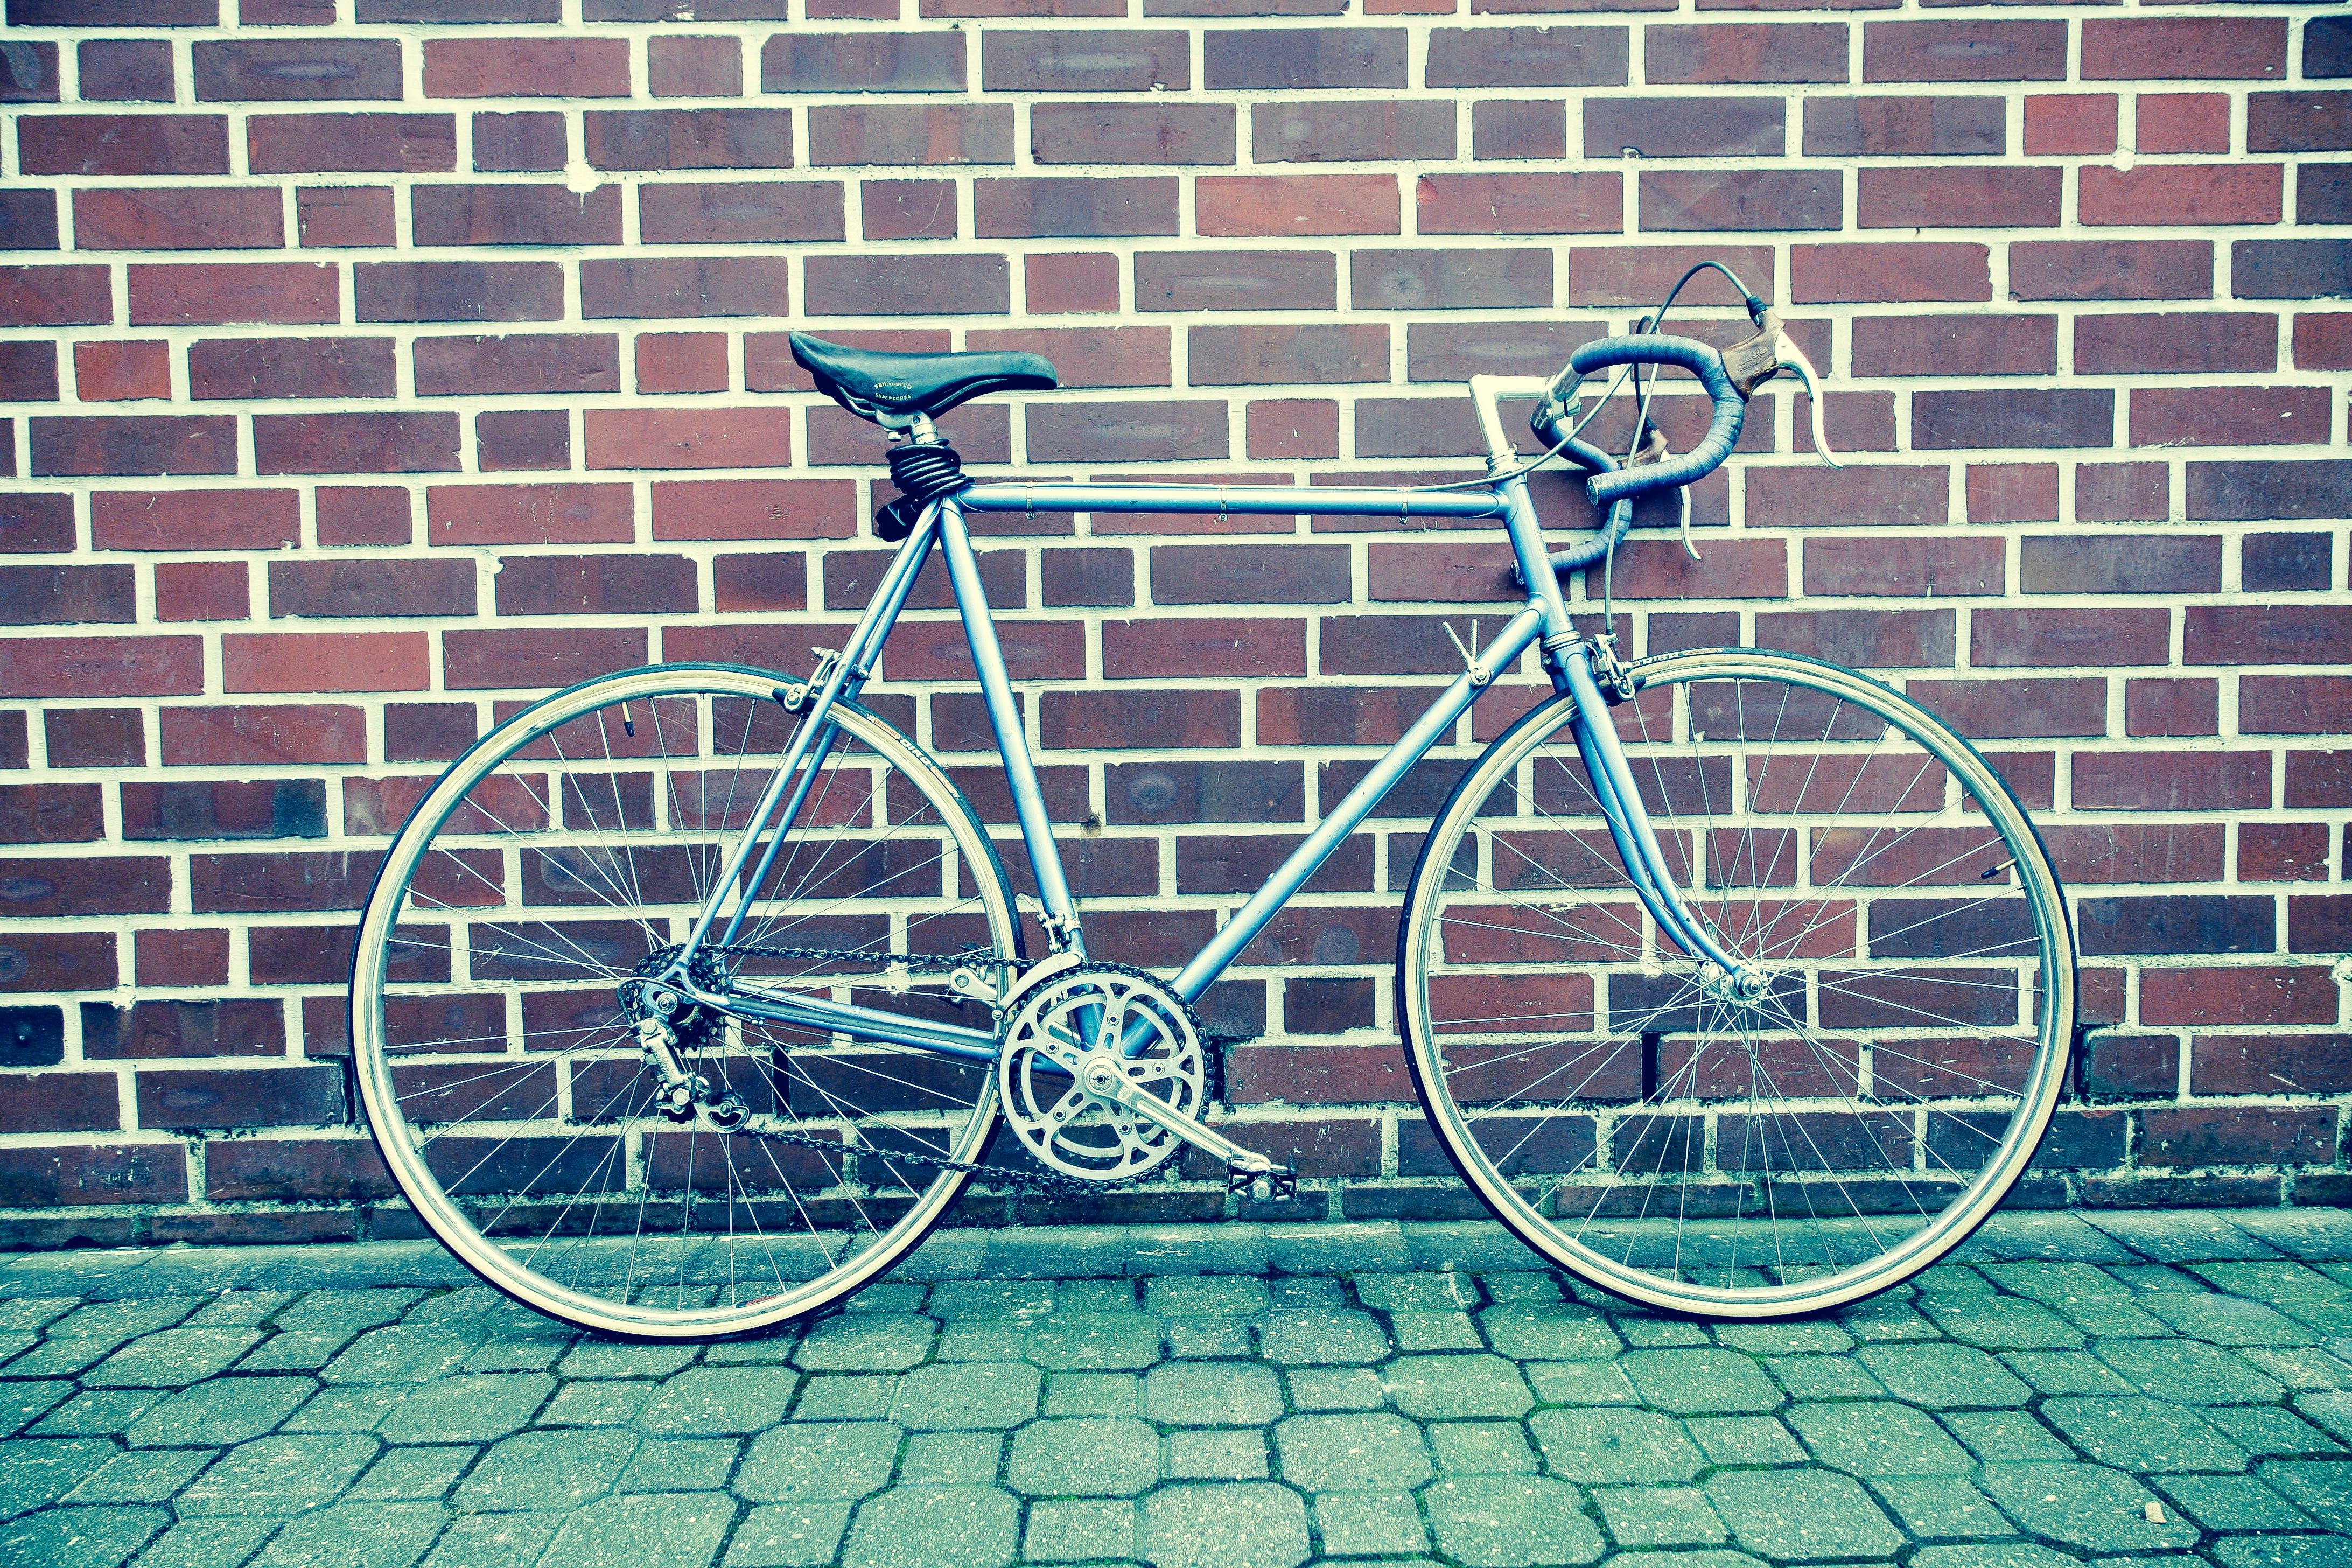 Teal and Black Road Bike Near Black and Brown Brick Wall